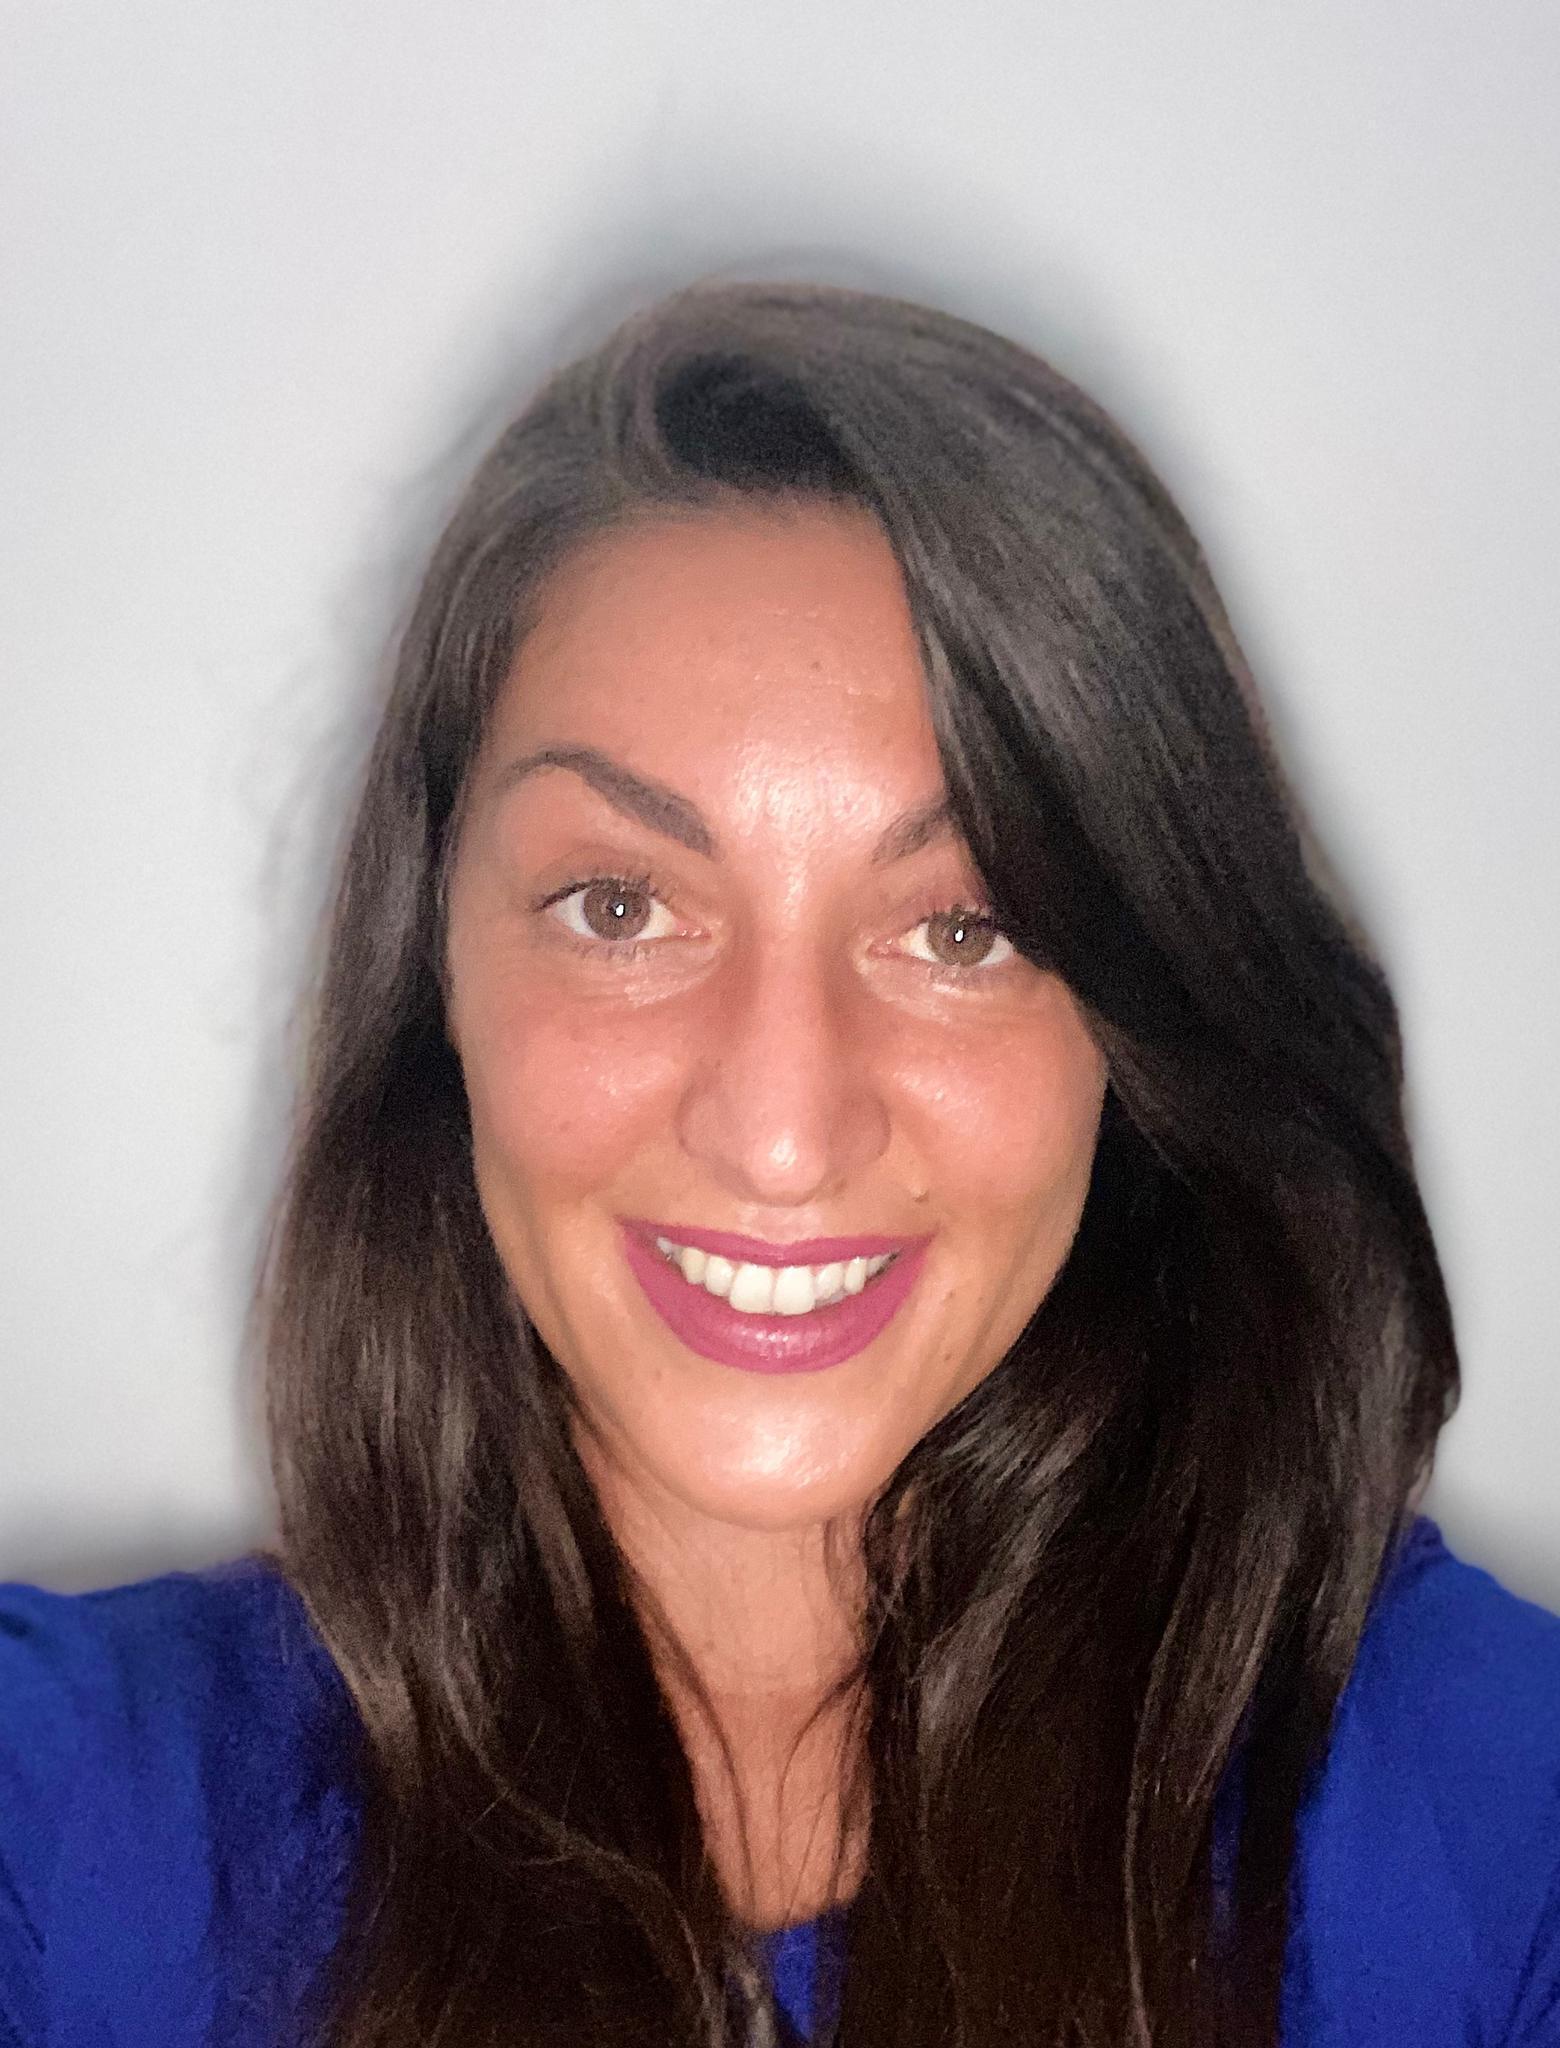 Elisa Cordì